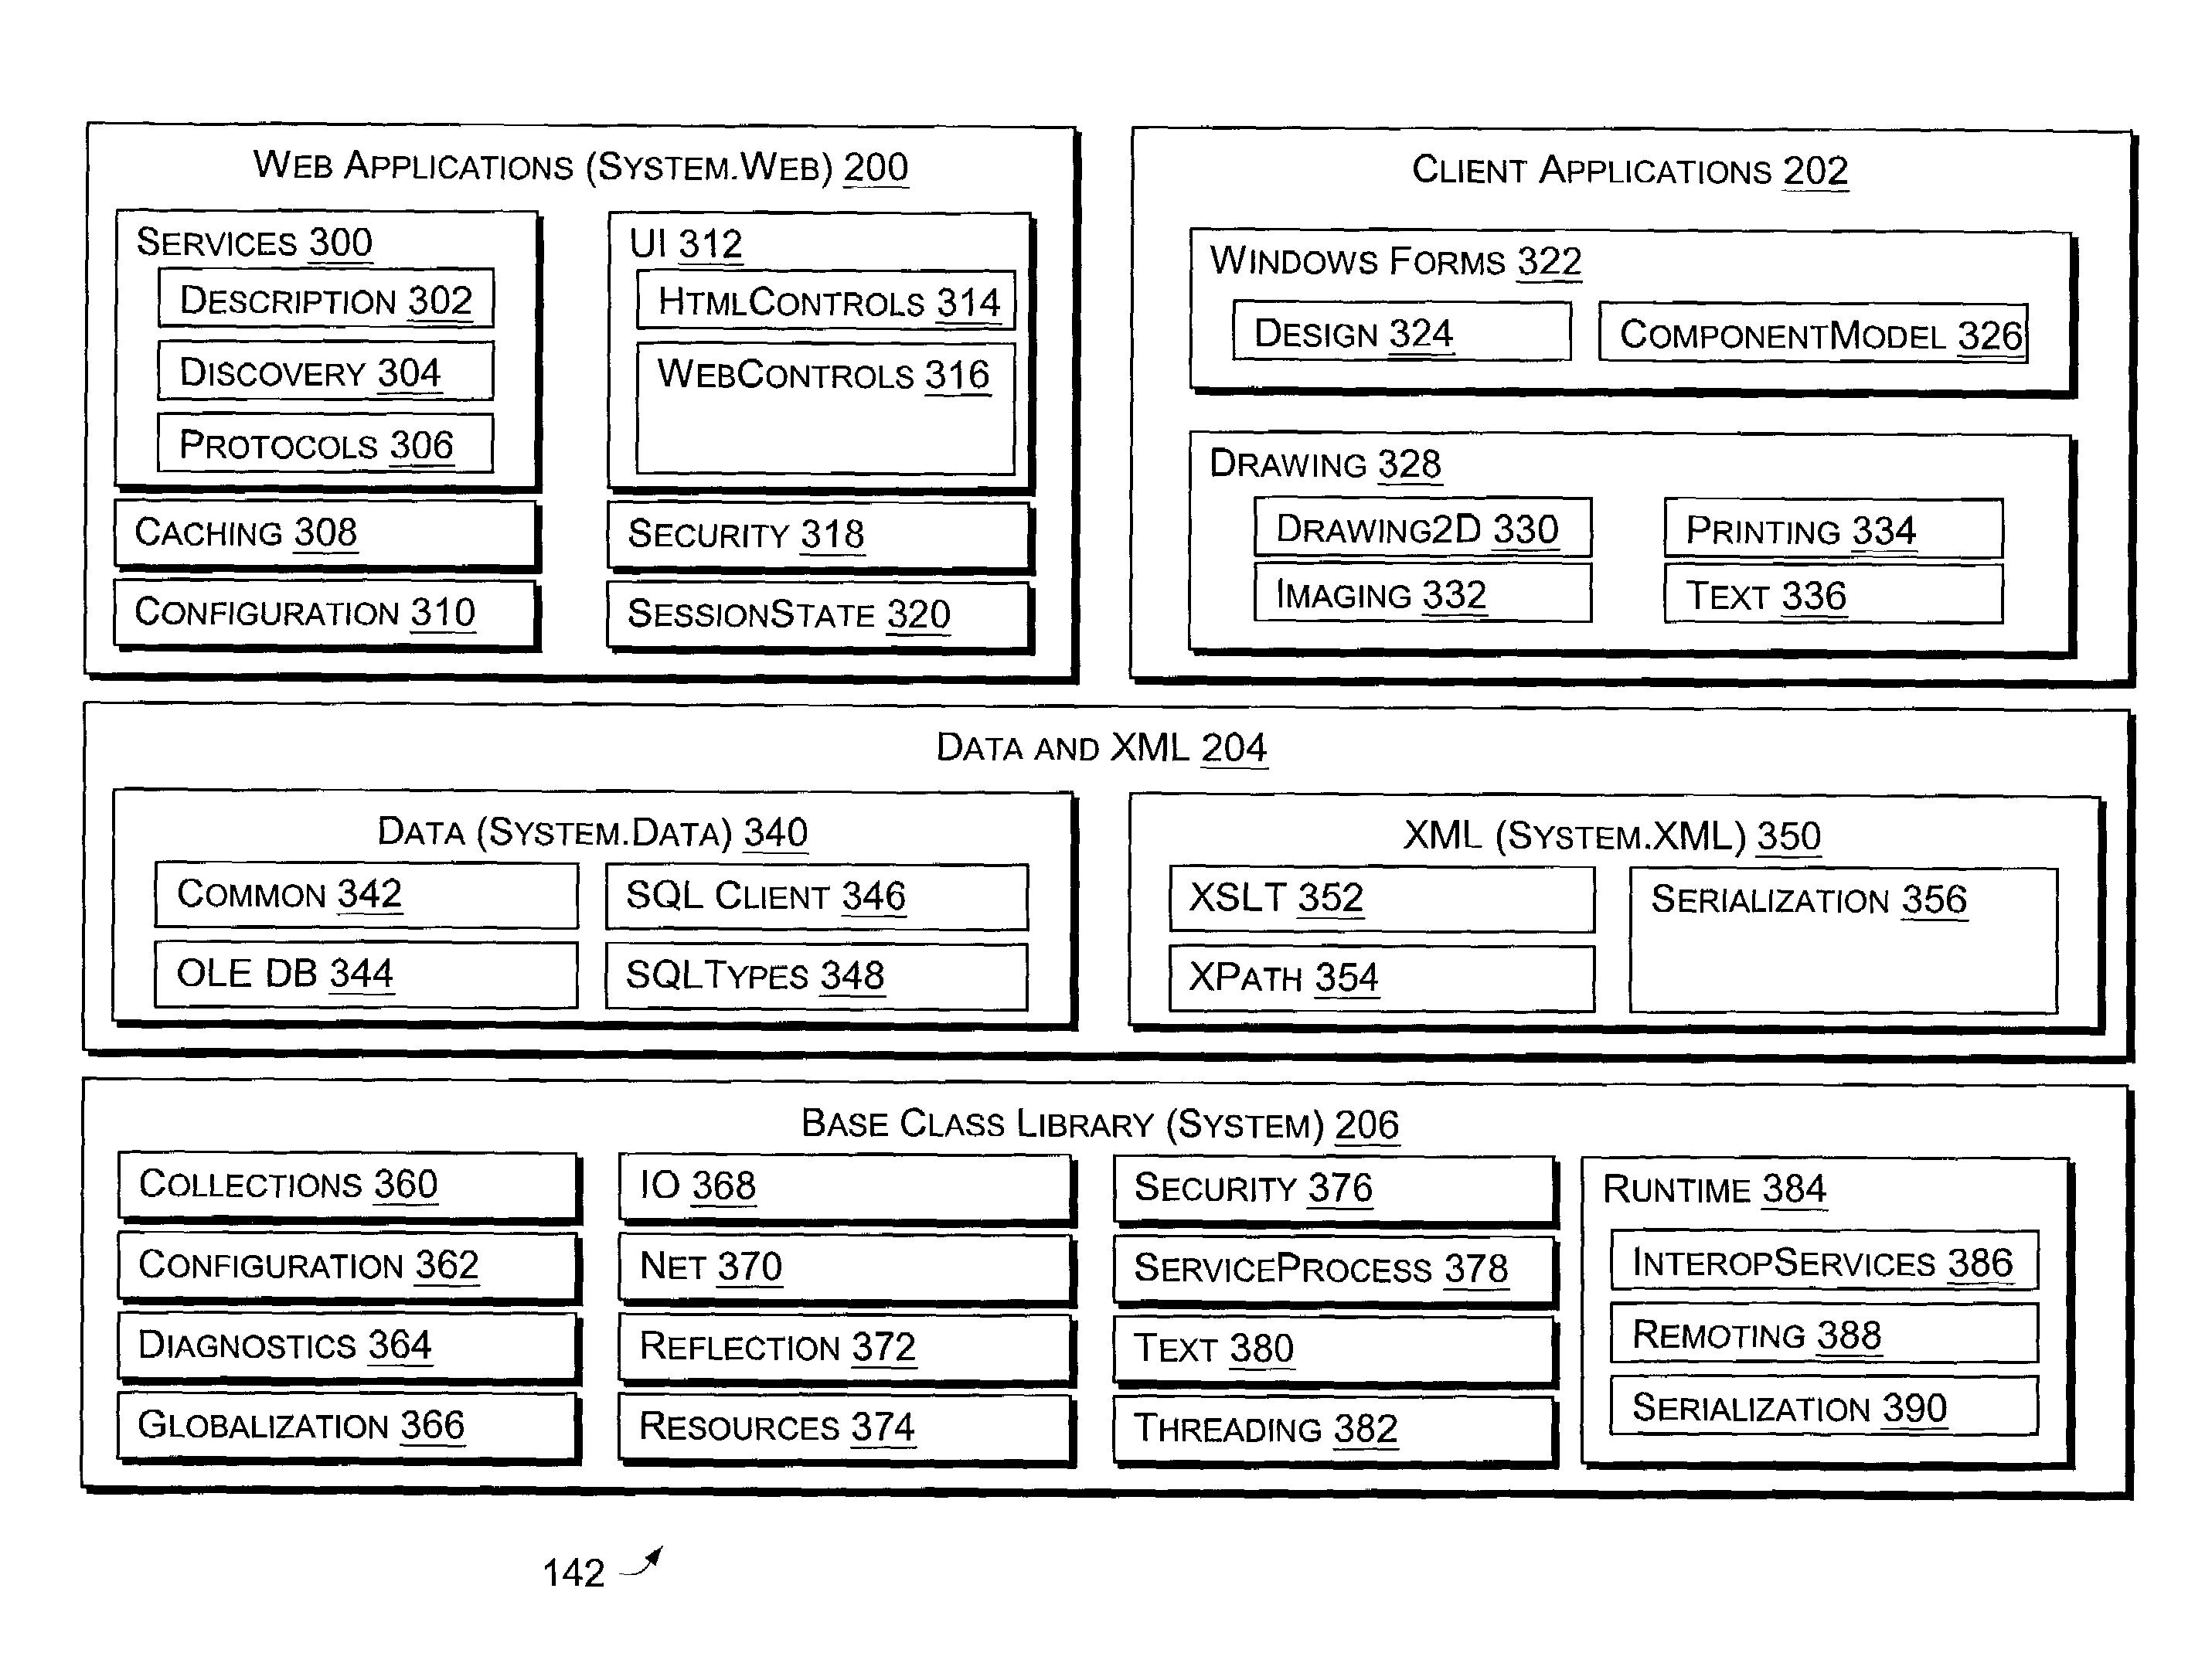 Patent US 7,117,504 B2